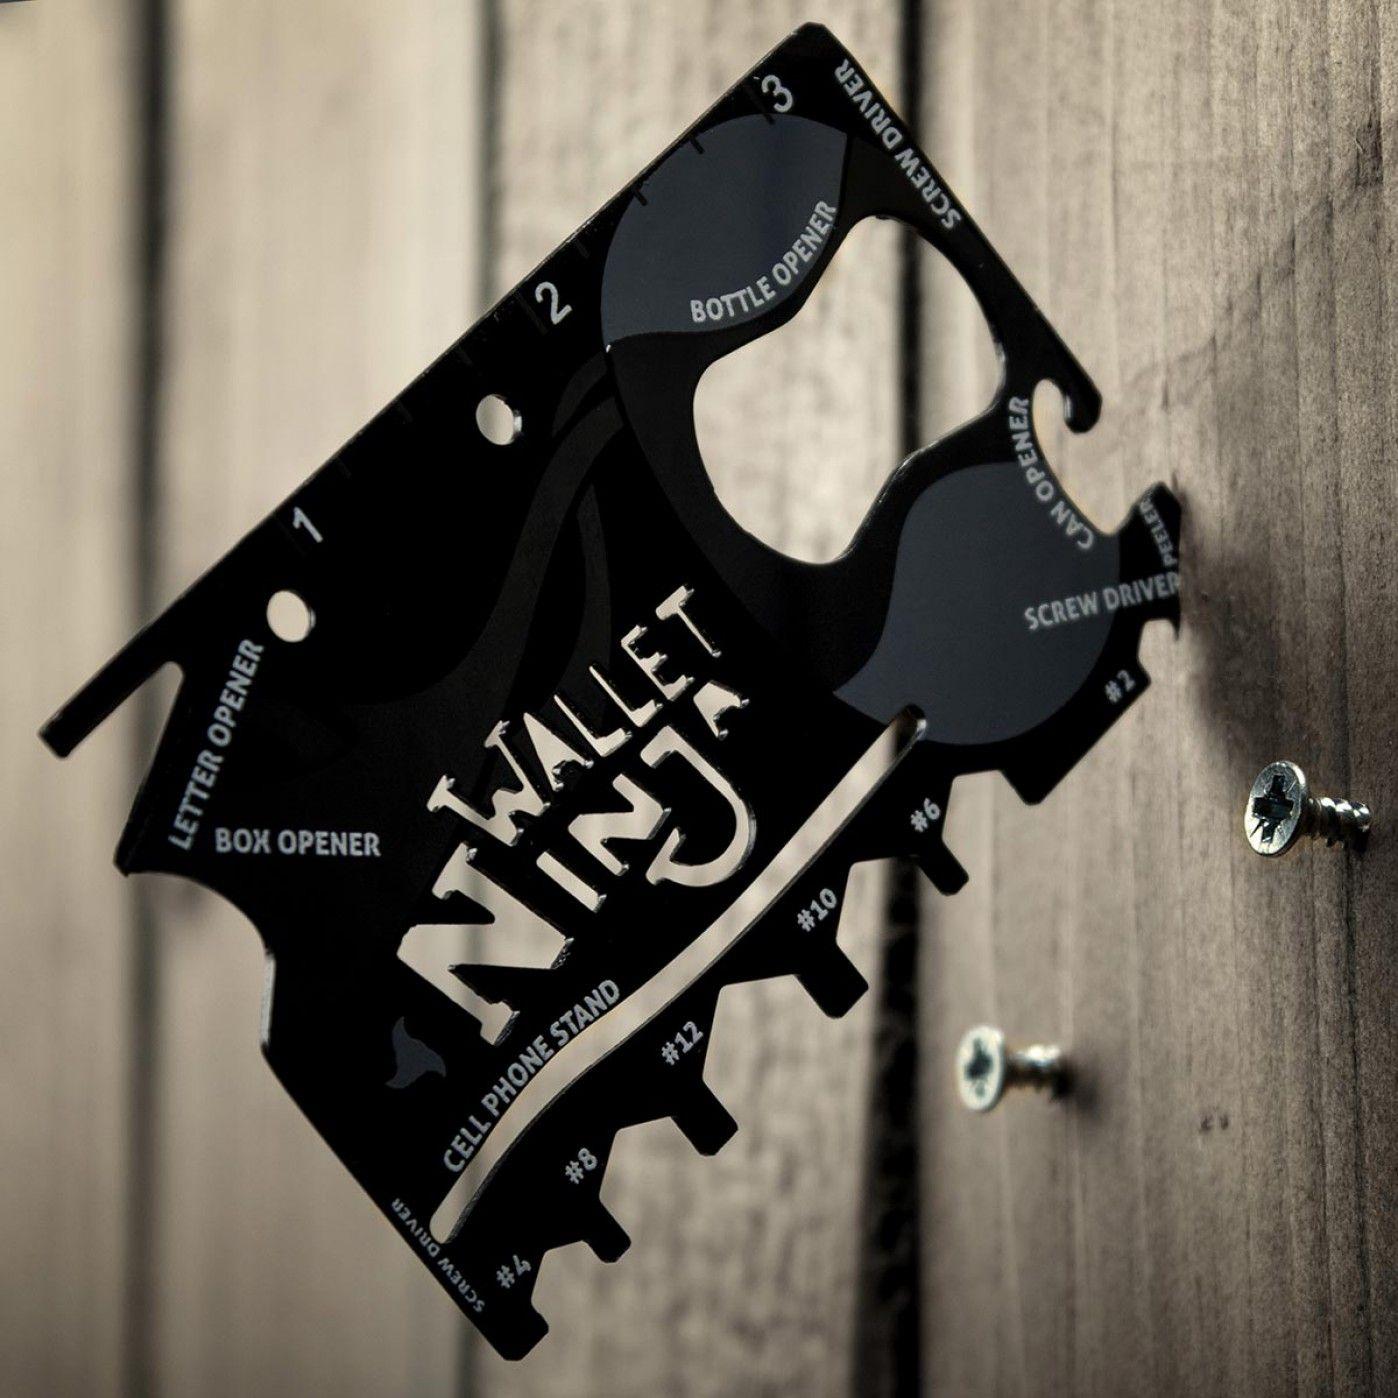 ninja 18 in 1 universeel gereedschap just like this. Black Bedroom Furniture Sets. Home Design Ideas